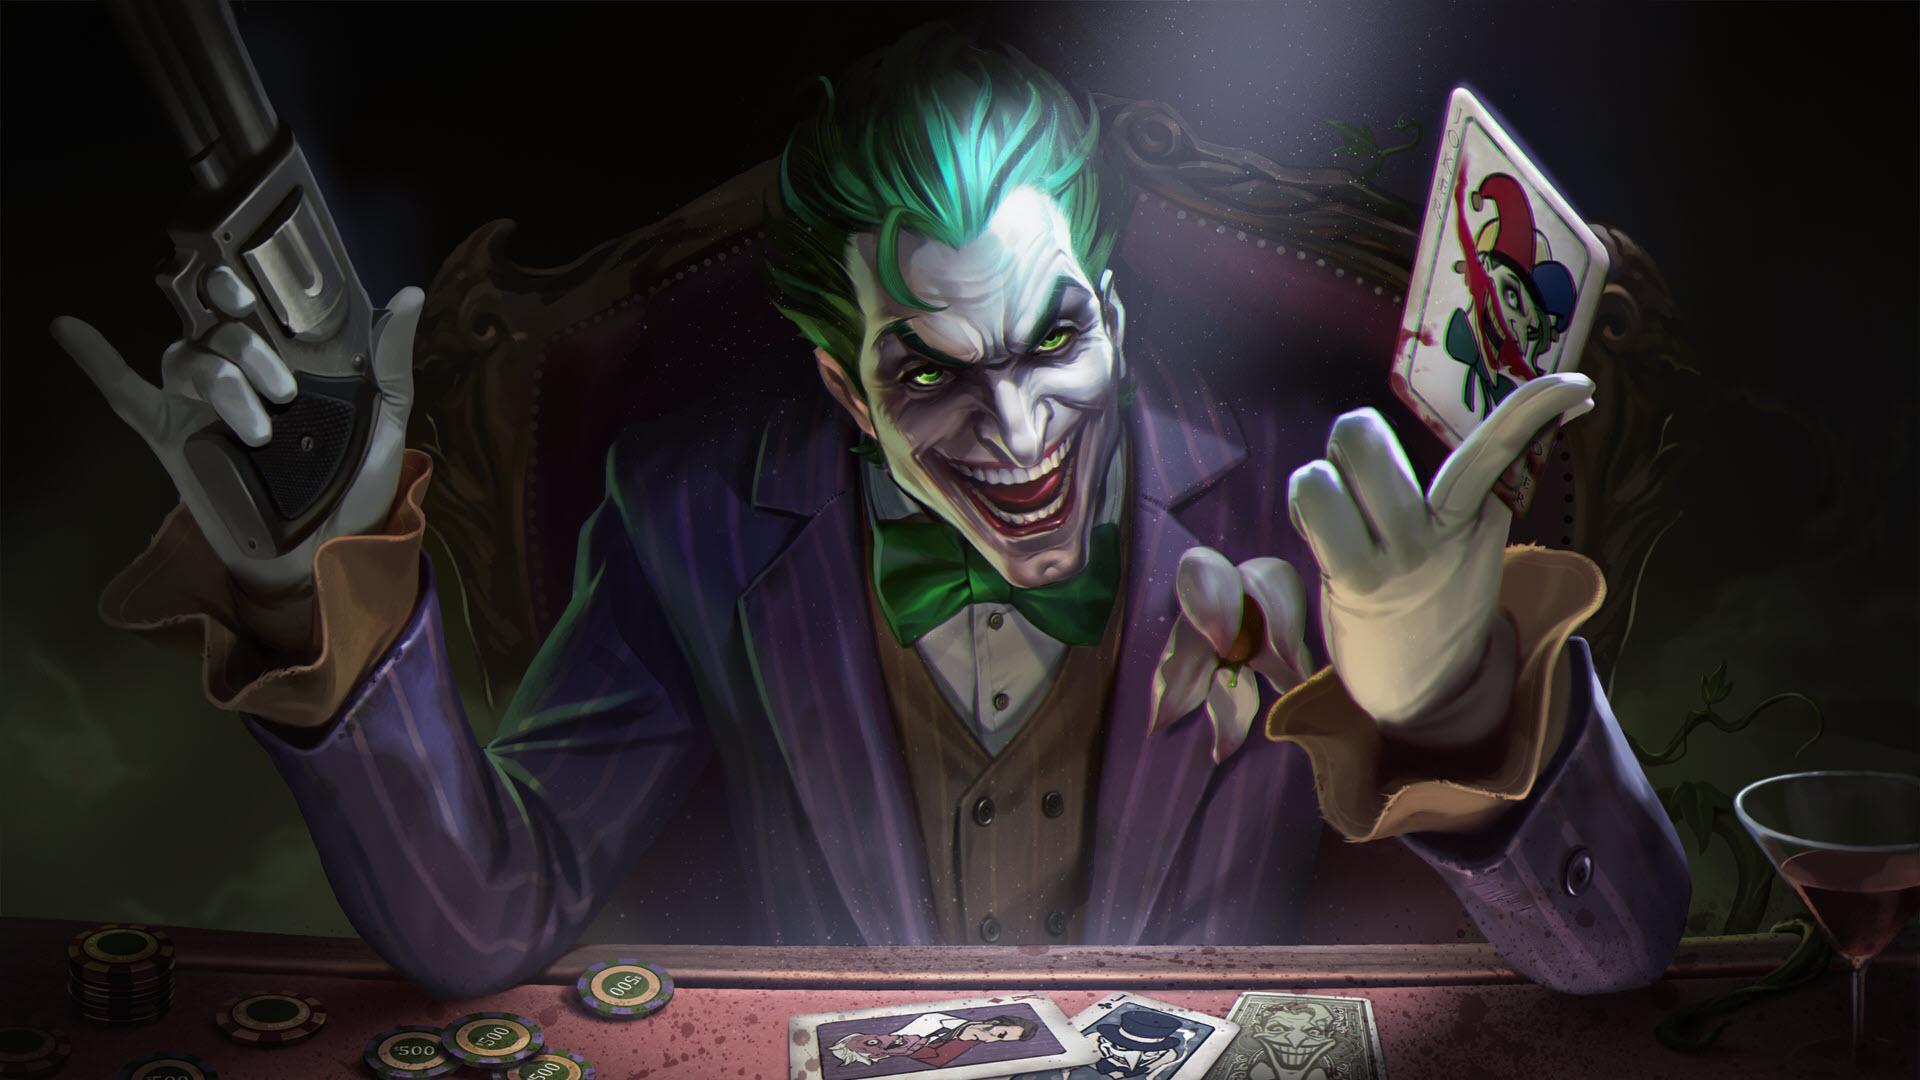 Hình nền liên quân joker